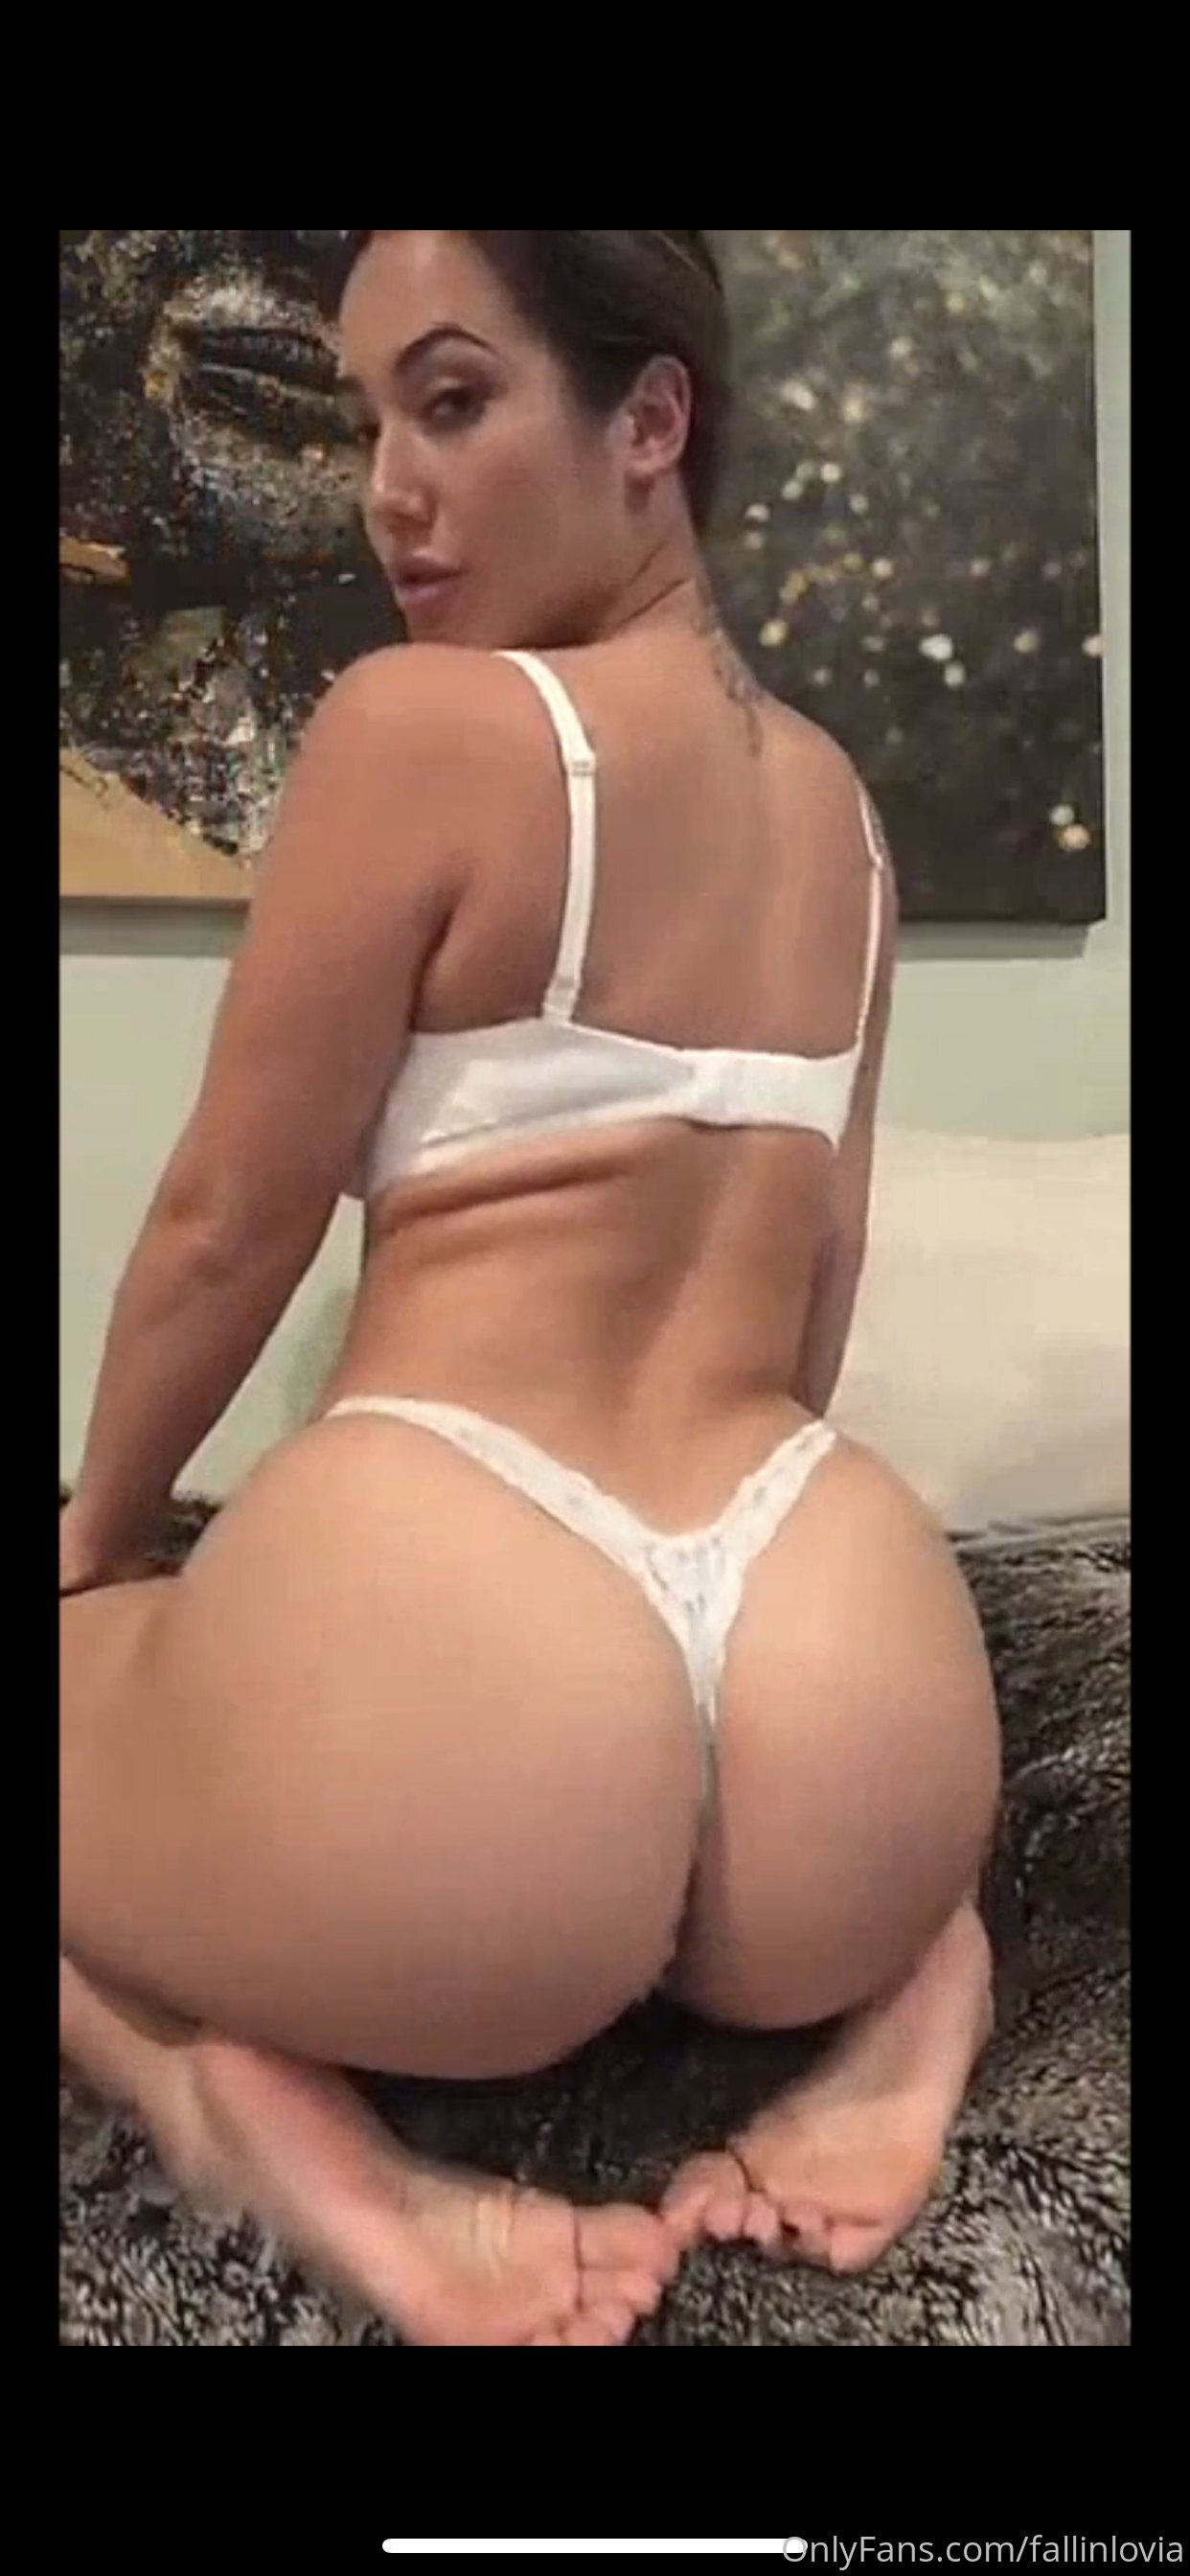 Eva Lovia, Fallinlovia, Onlyfans 0129